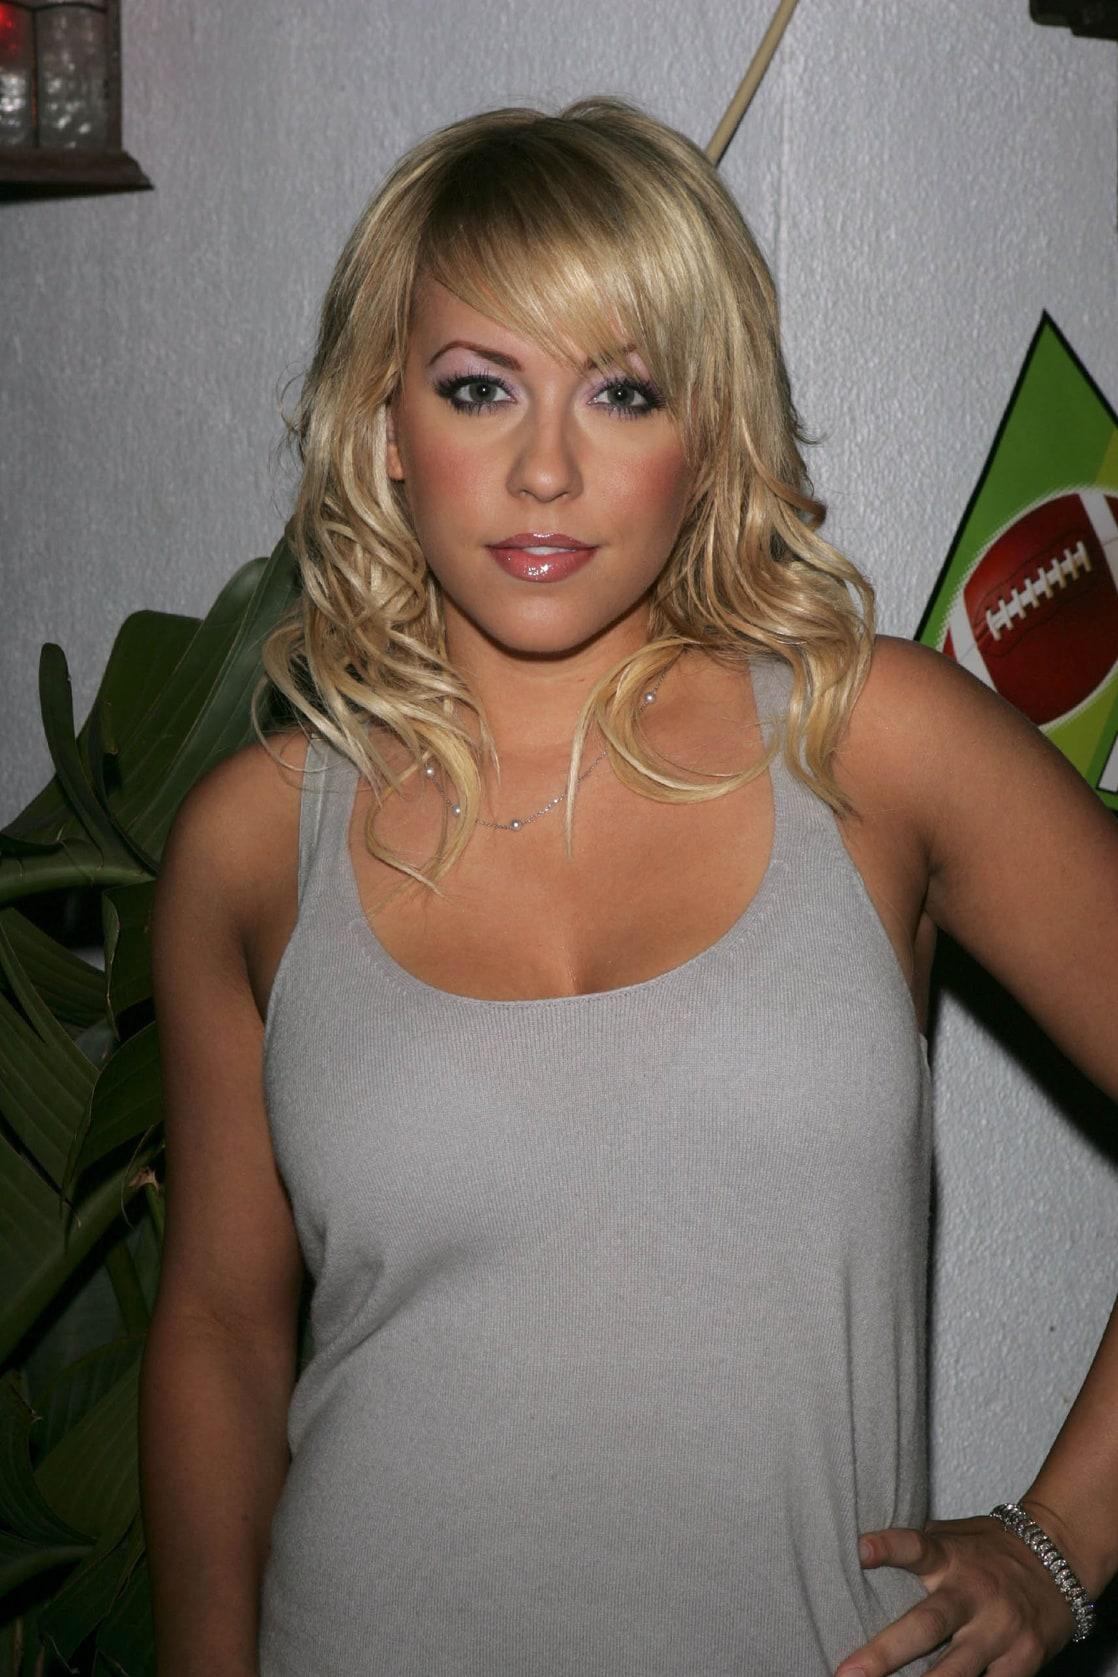 Mary Jones (actress),Nancy Giles Porn clips Tatiana Kovylina RUS 2 2005, 2009,Sami Gayle